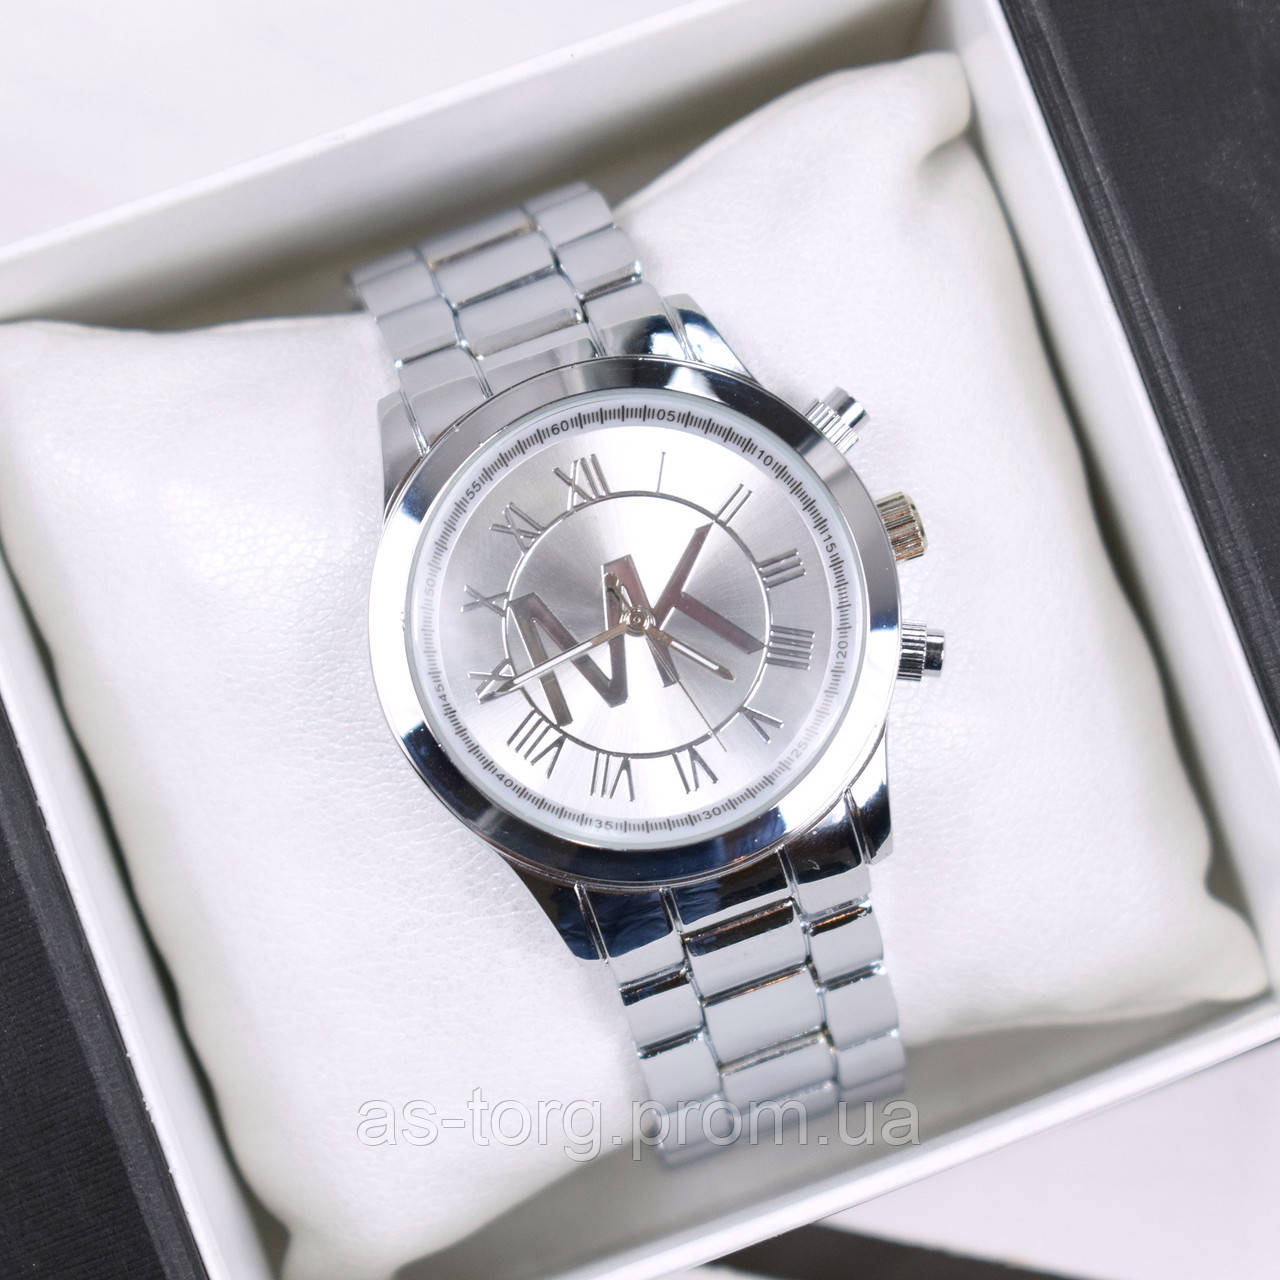 13430a347a96 Часы женские наручные MK Oslo серебро, часы дропшиппинг  продажа ...